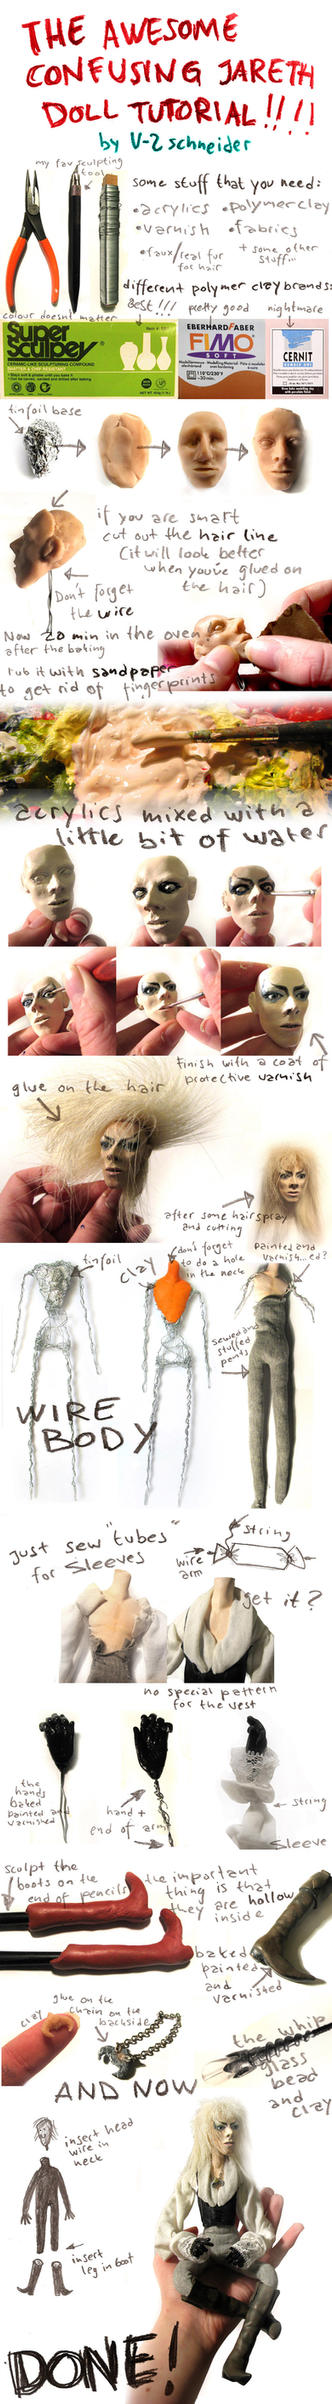 Jareth Doll Tutorial by V-2schneider